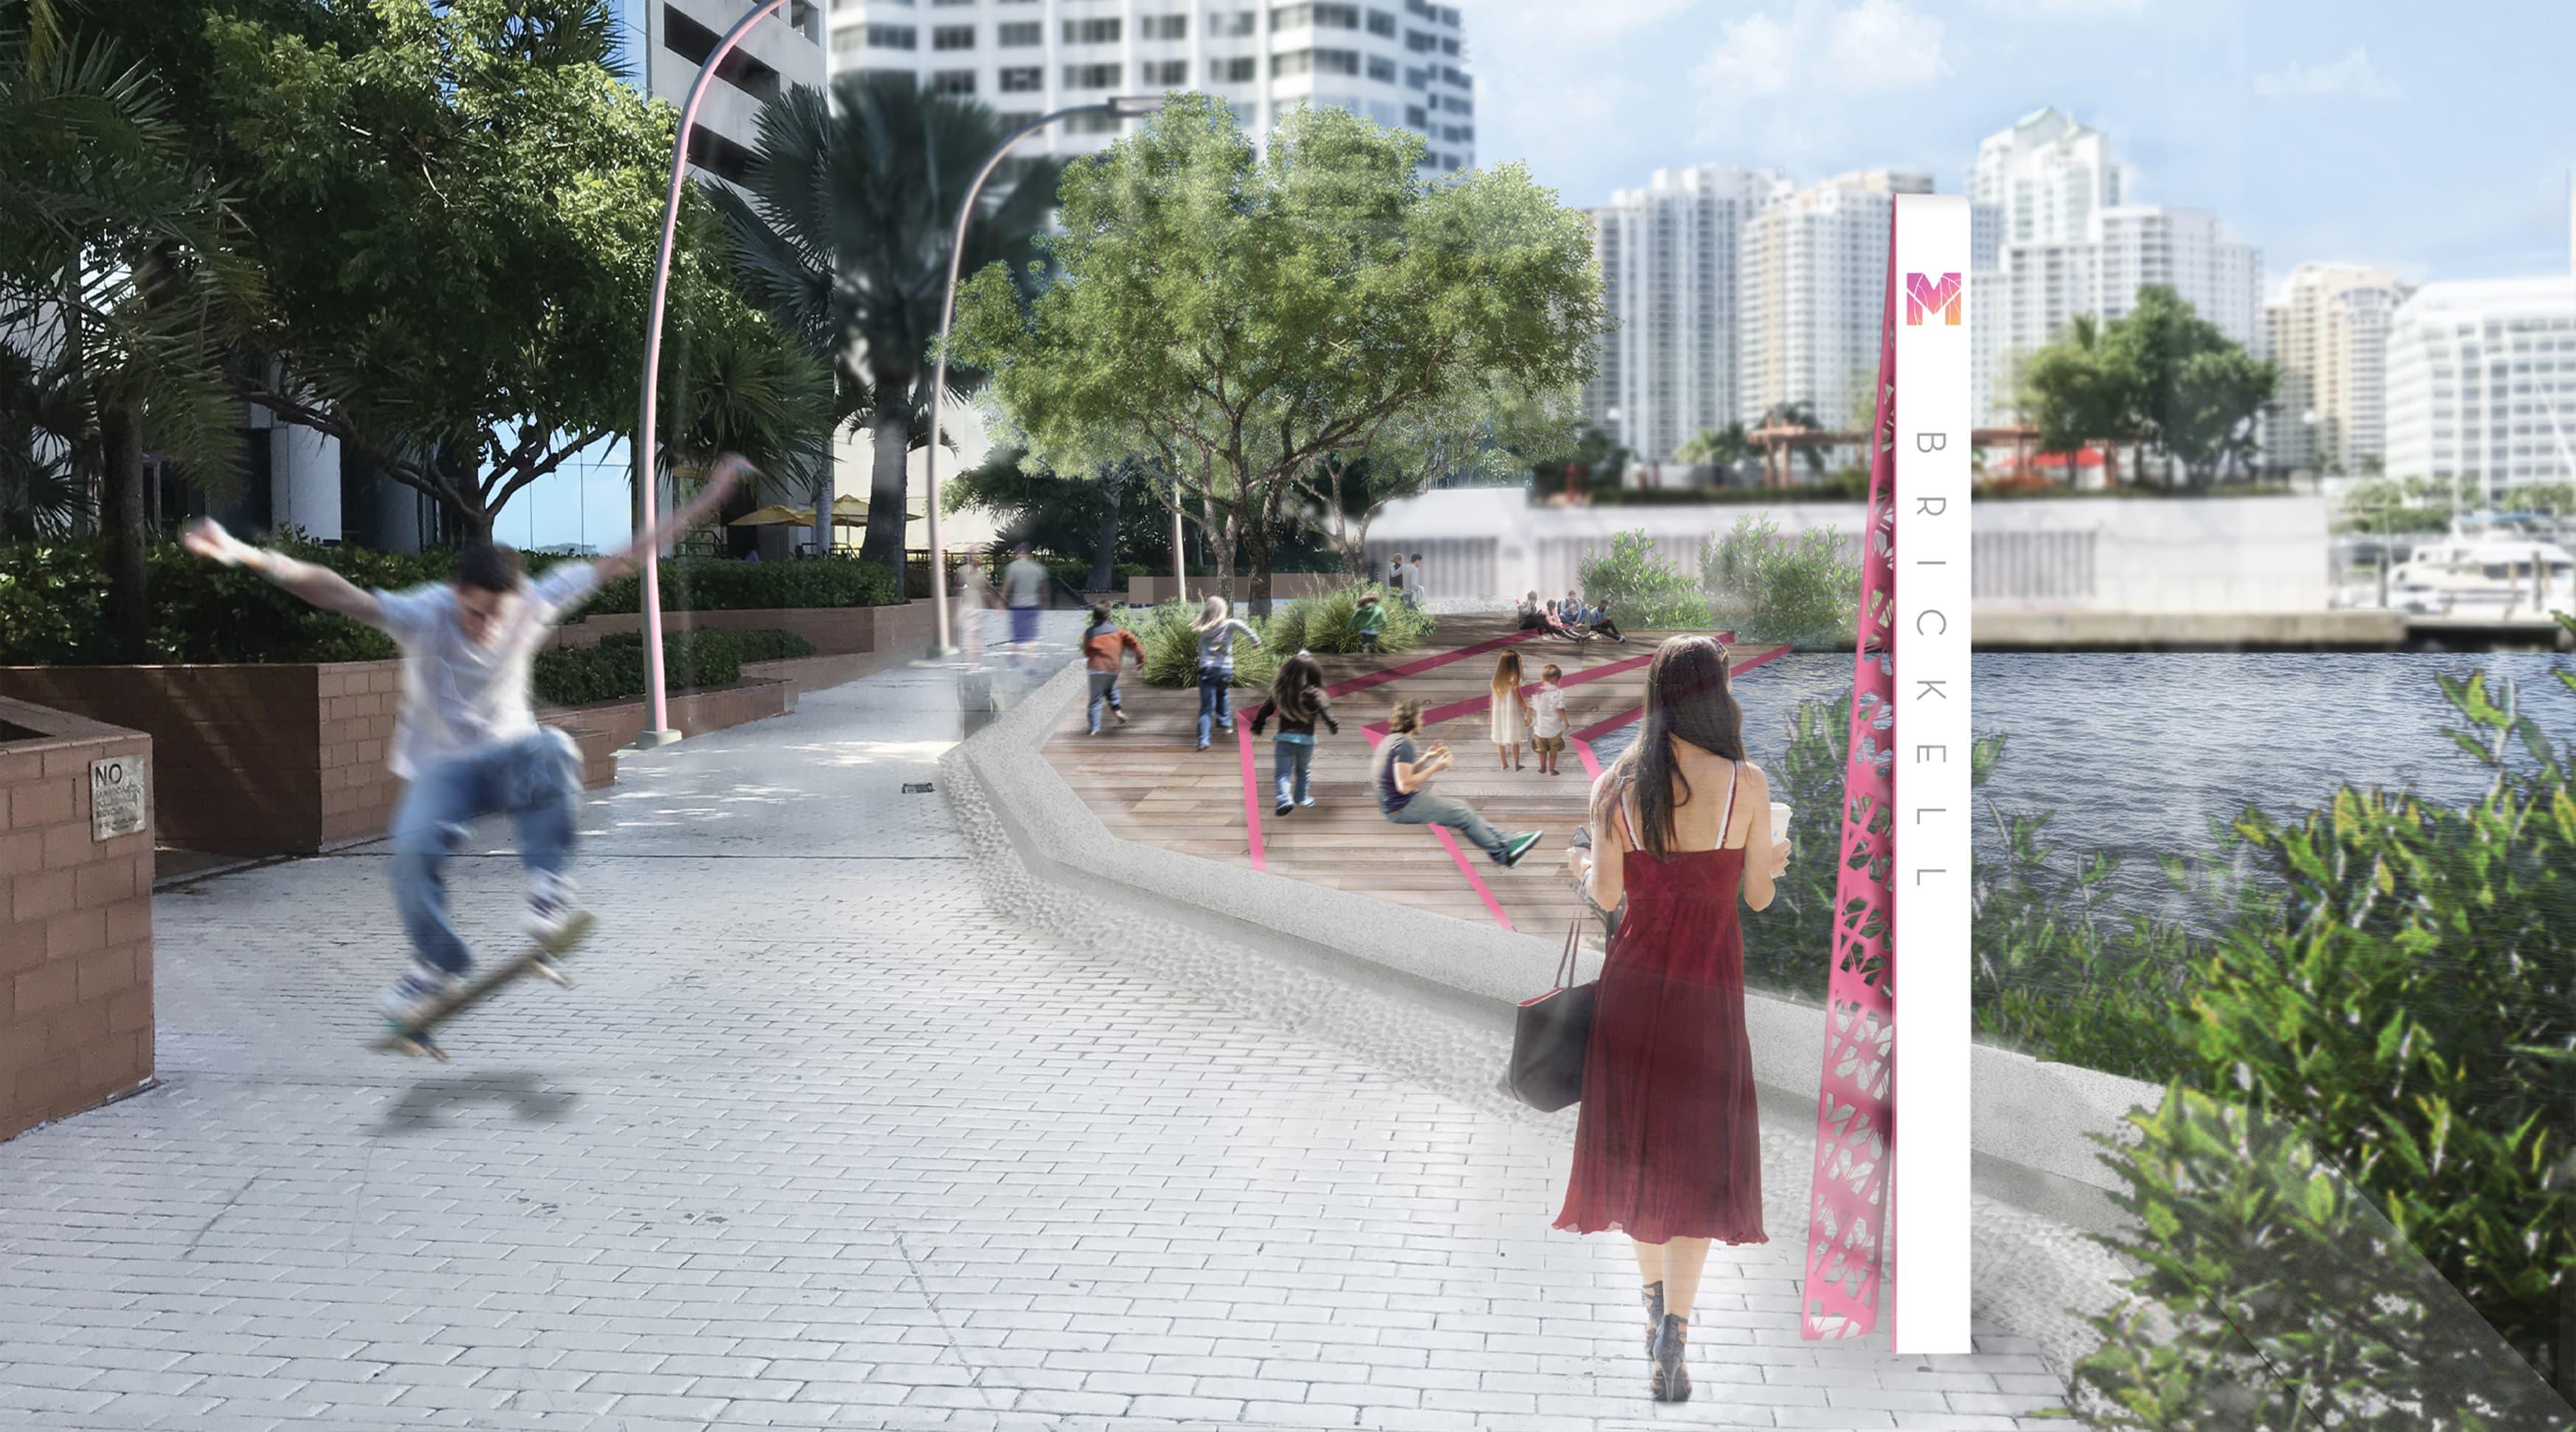 Civic Design, Transit Design, Waterfront Wayfinding Design, Streetscape Design, Park Wayfinding & Signage. Urban Wayfinding Signage.